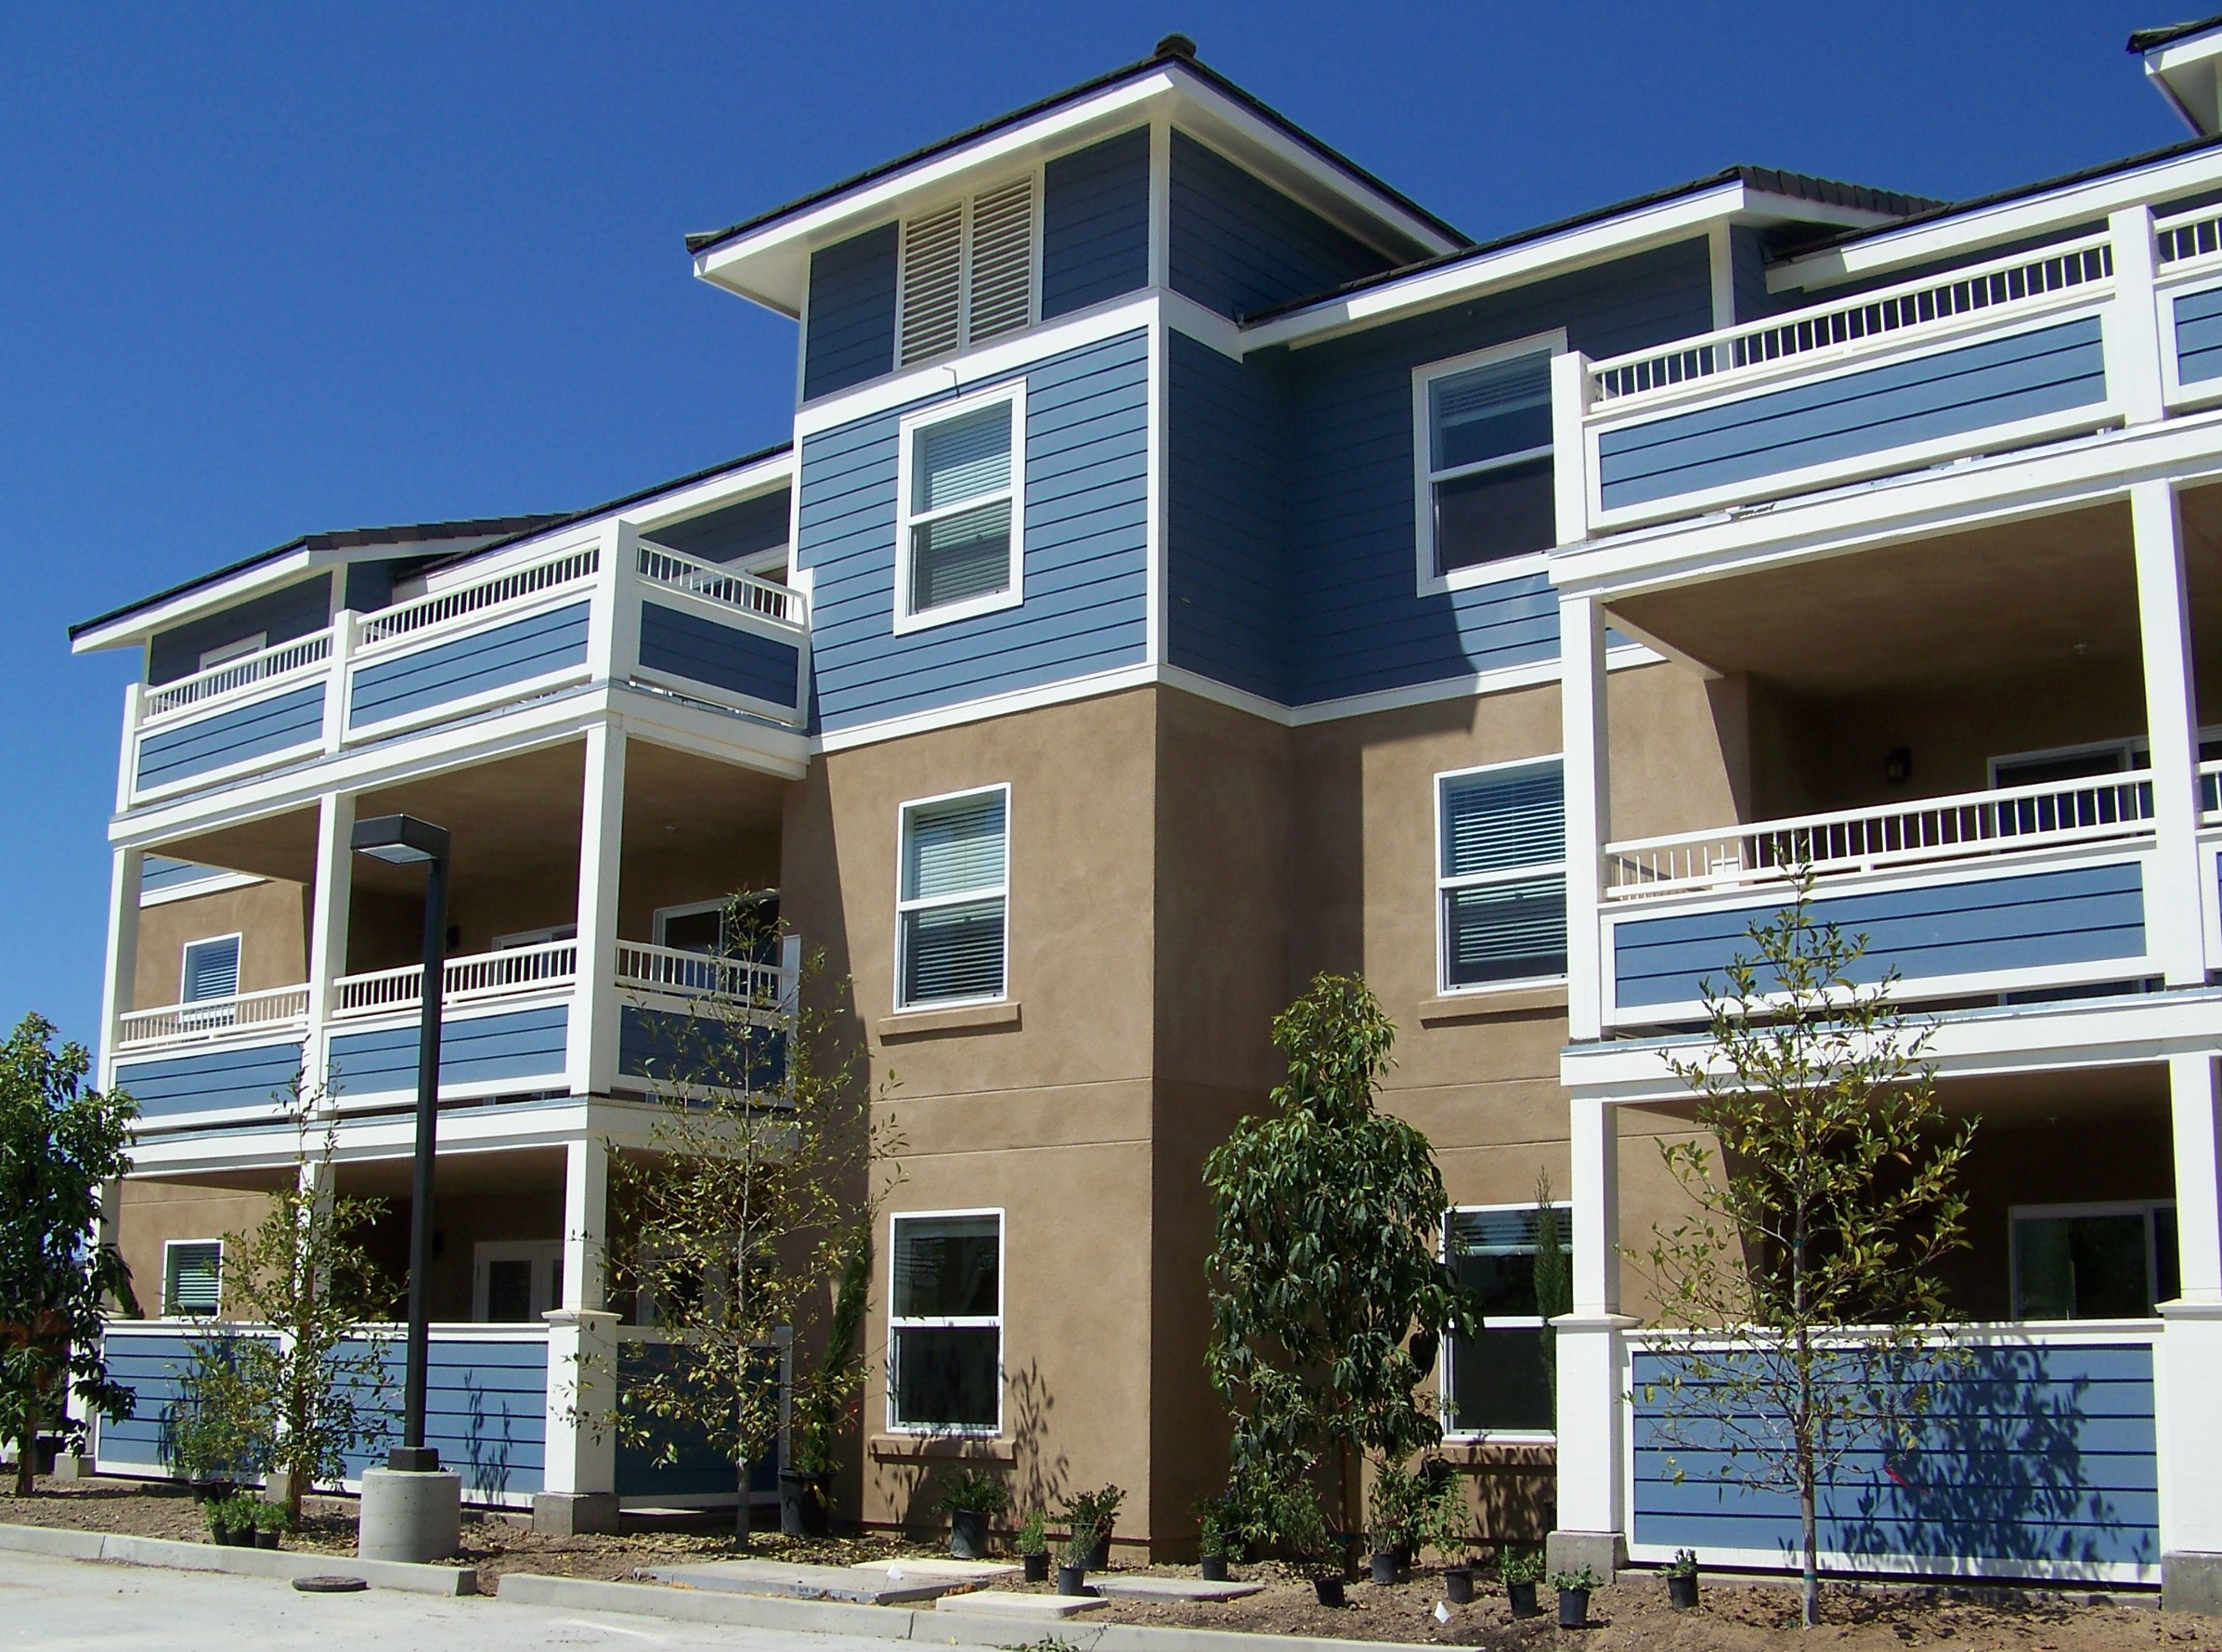 Courtland Street Apartments